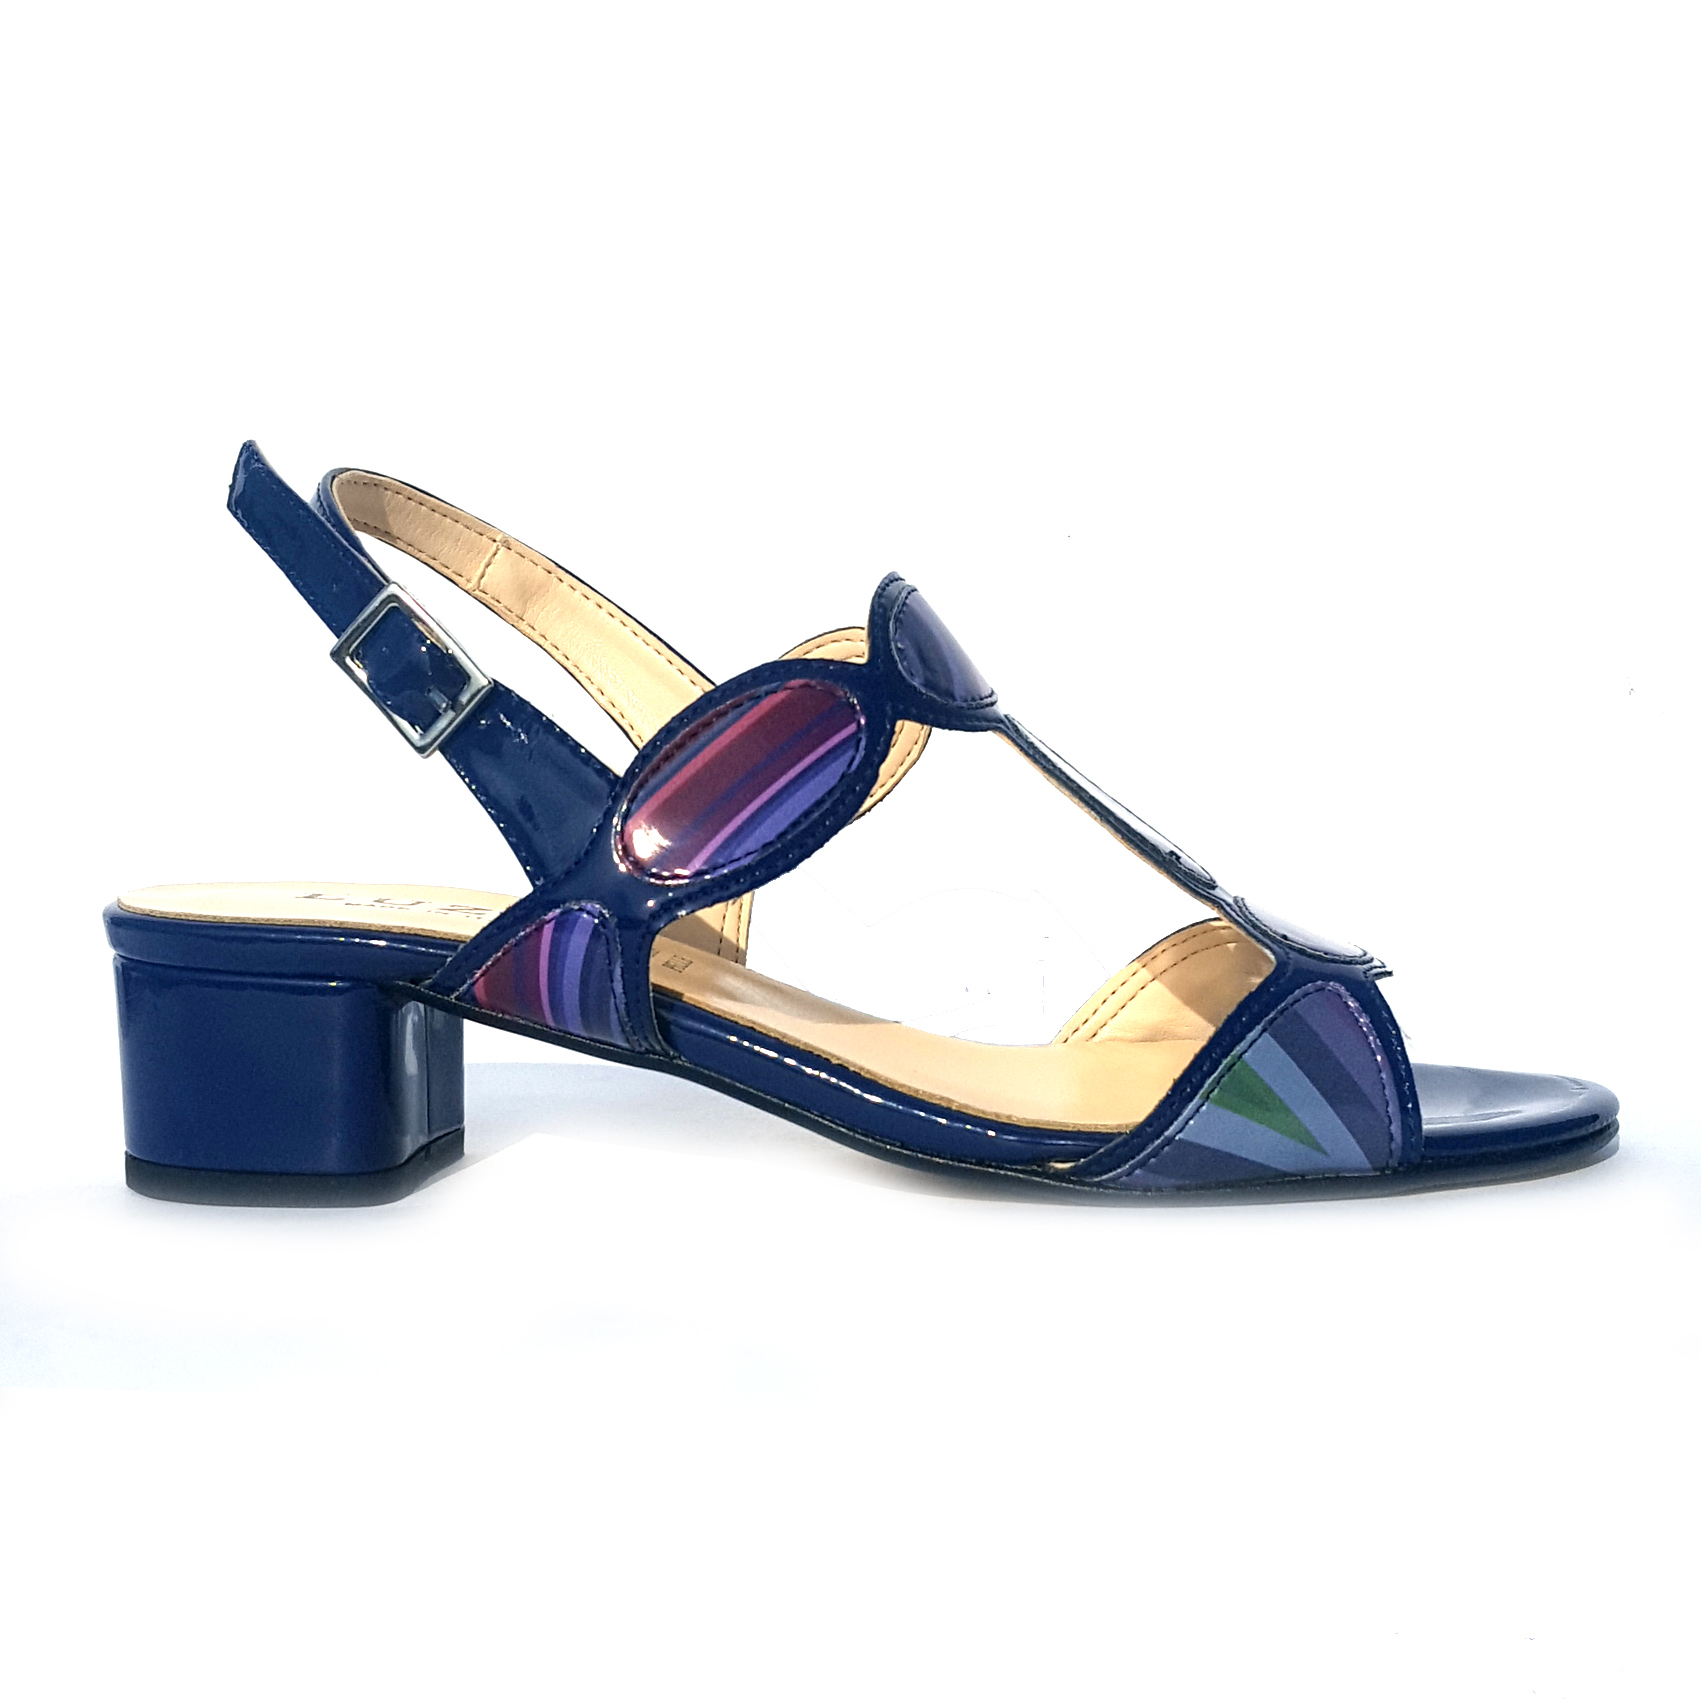 Sandalo royal/multicolor Luzzi